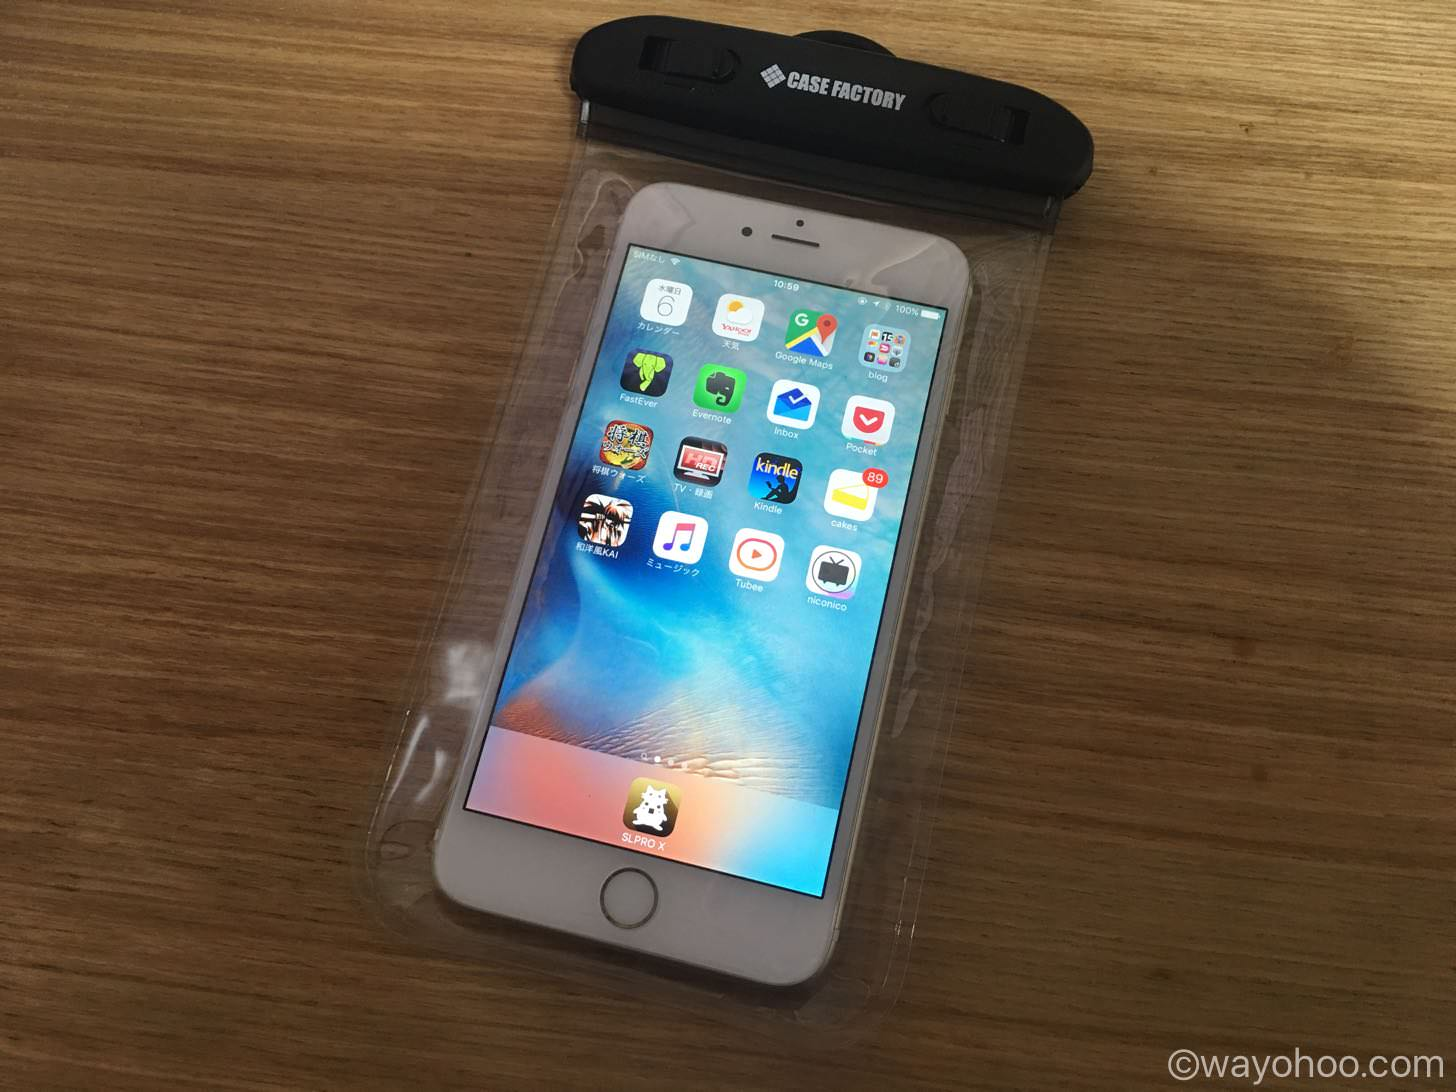 iPhone 6 Plusが入ったCASE FACTORY 防水ケース AQUA MARINA